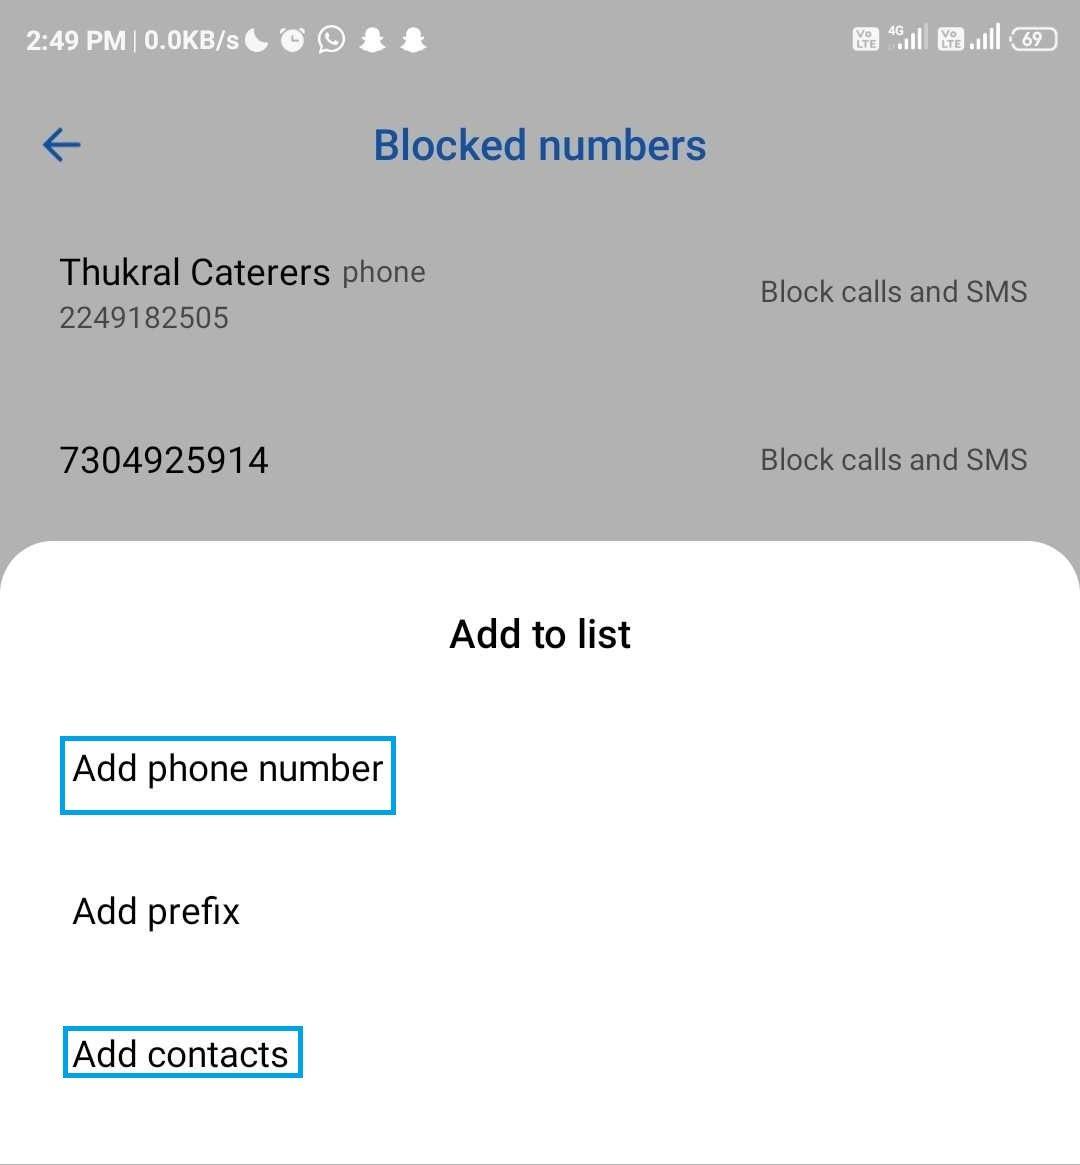 screenshot_2020-02-10-14-49-31-183_com-miui_-securitycenter-5780913